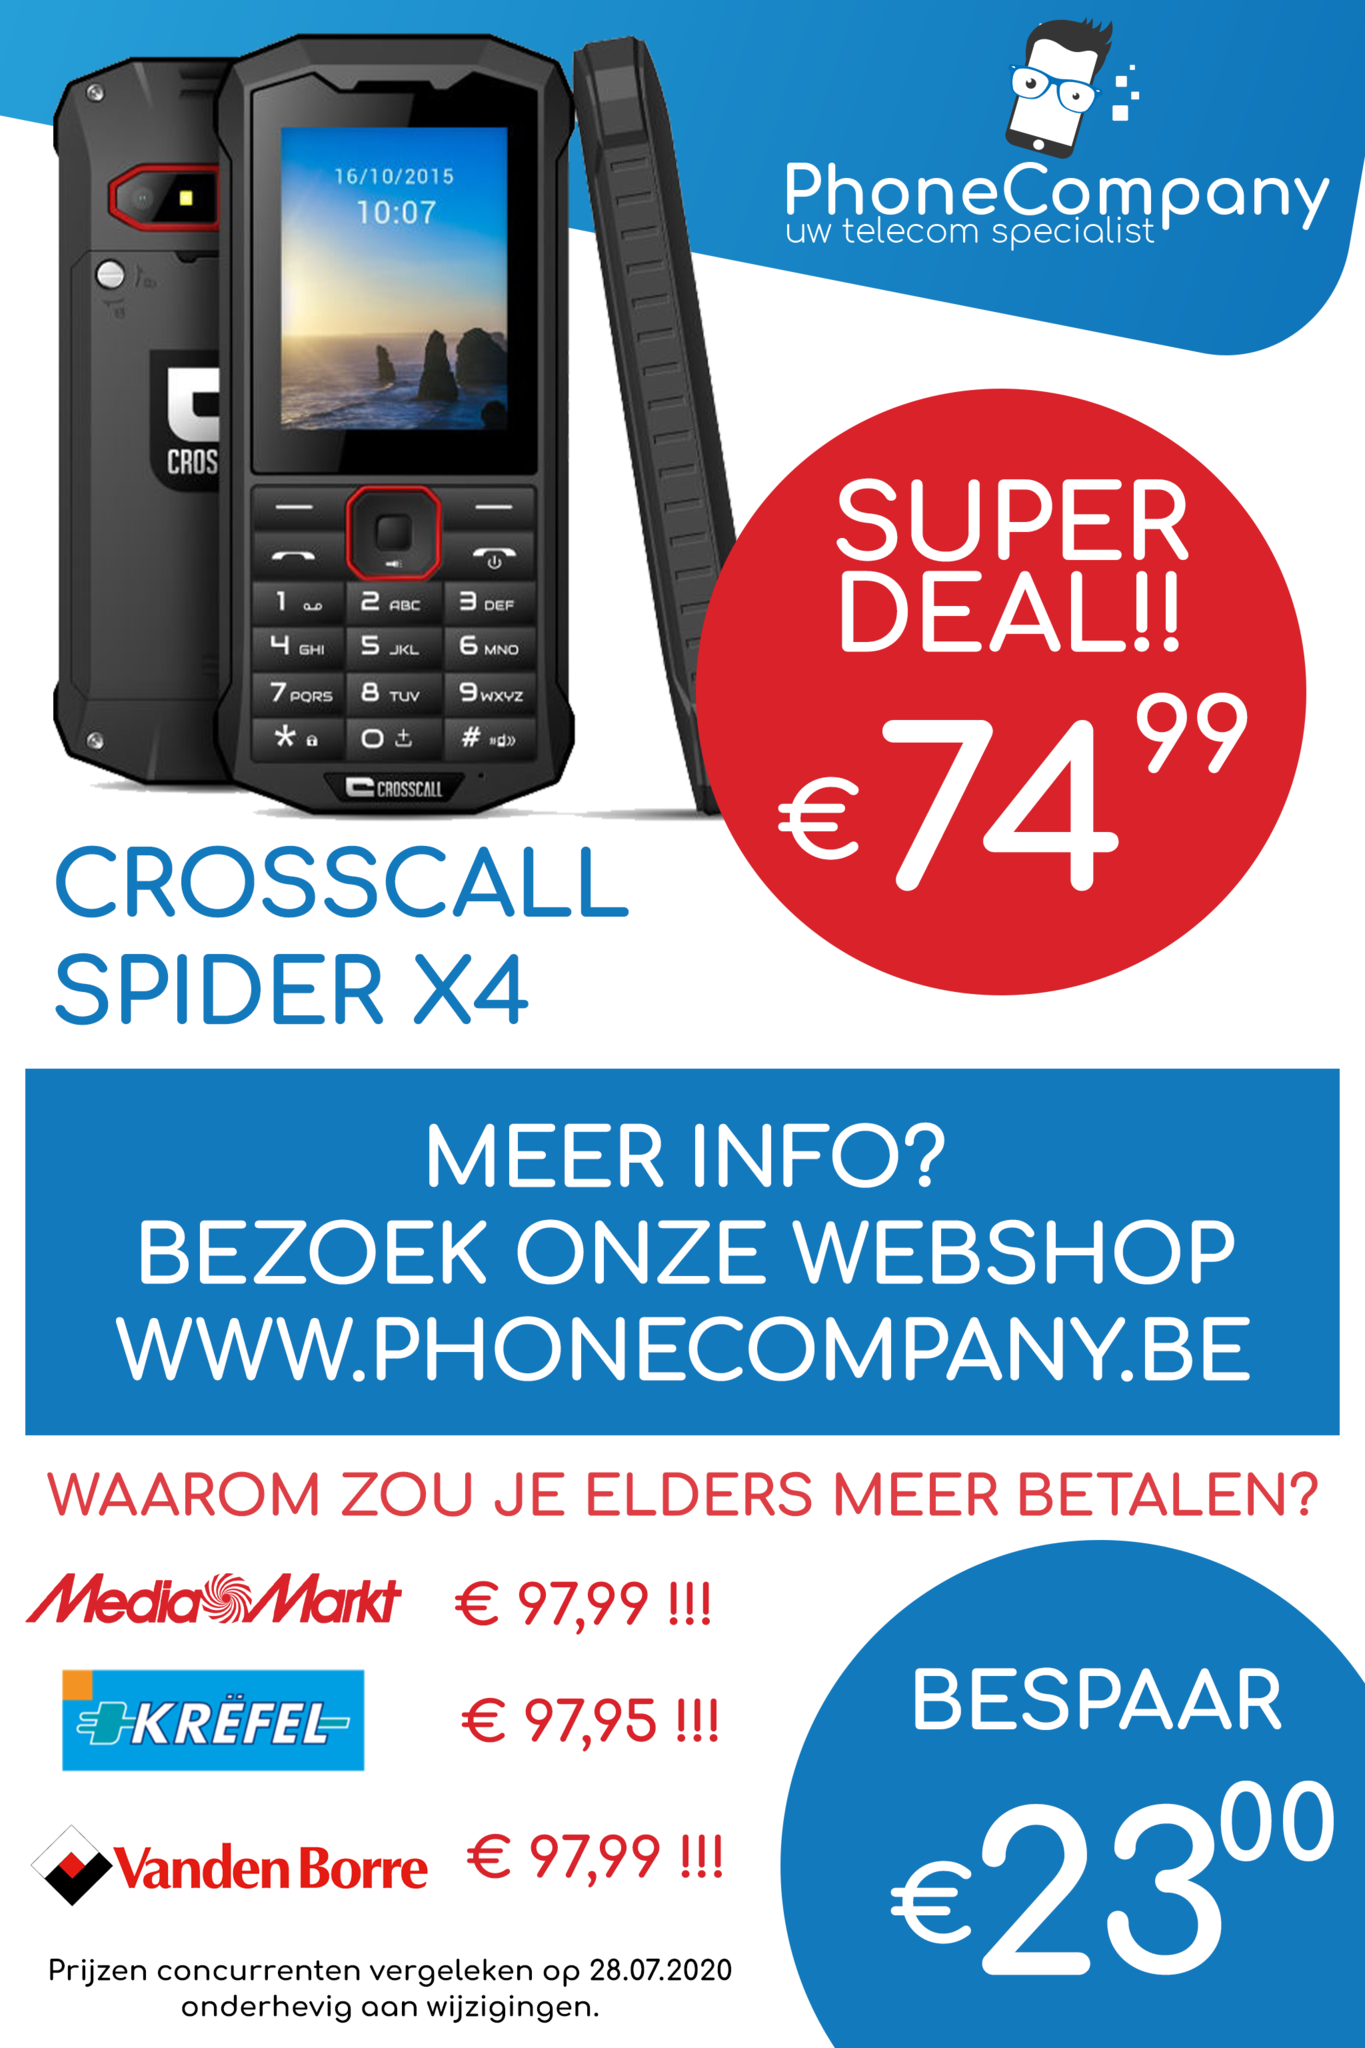 Crosscall Spider X4